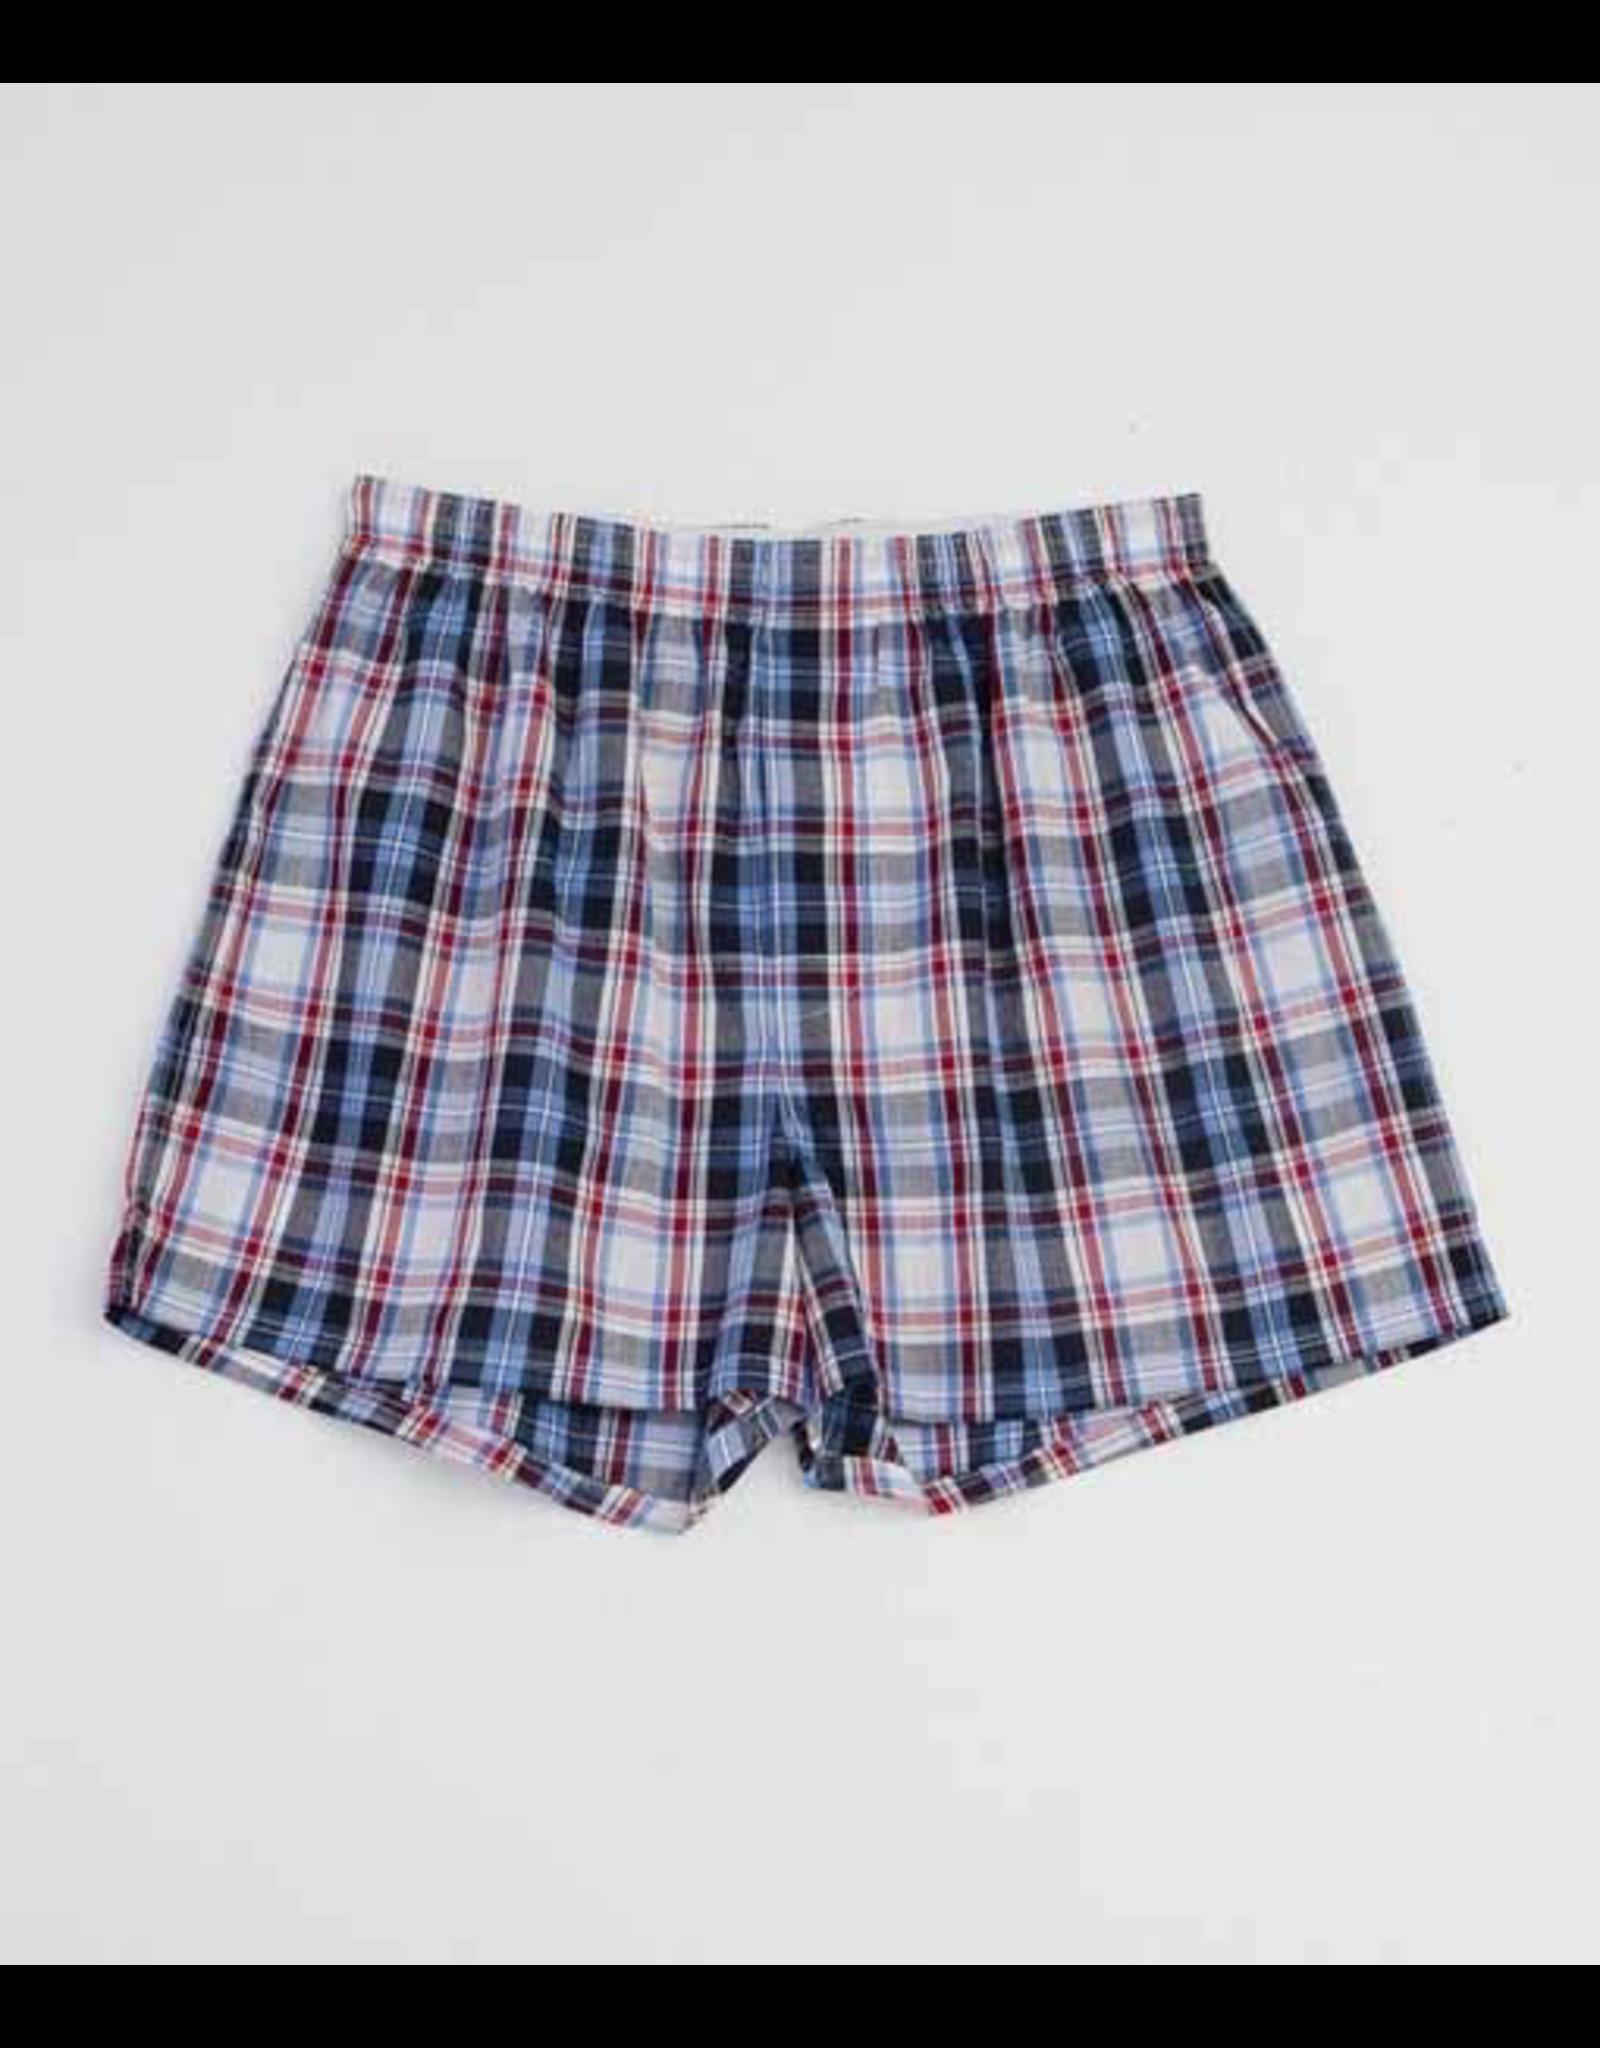 Australia Tom Men's Boxer Short (Size Medium)